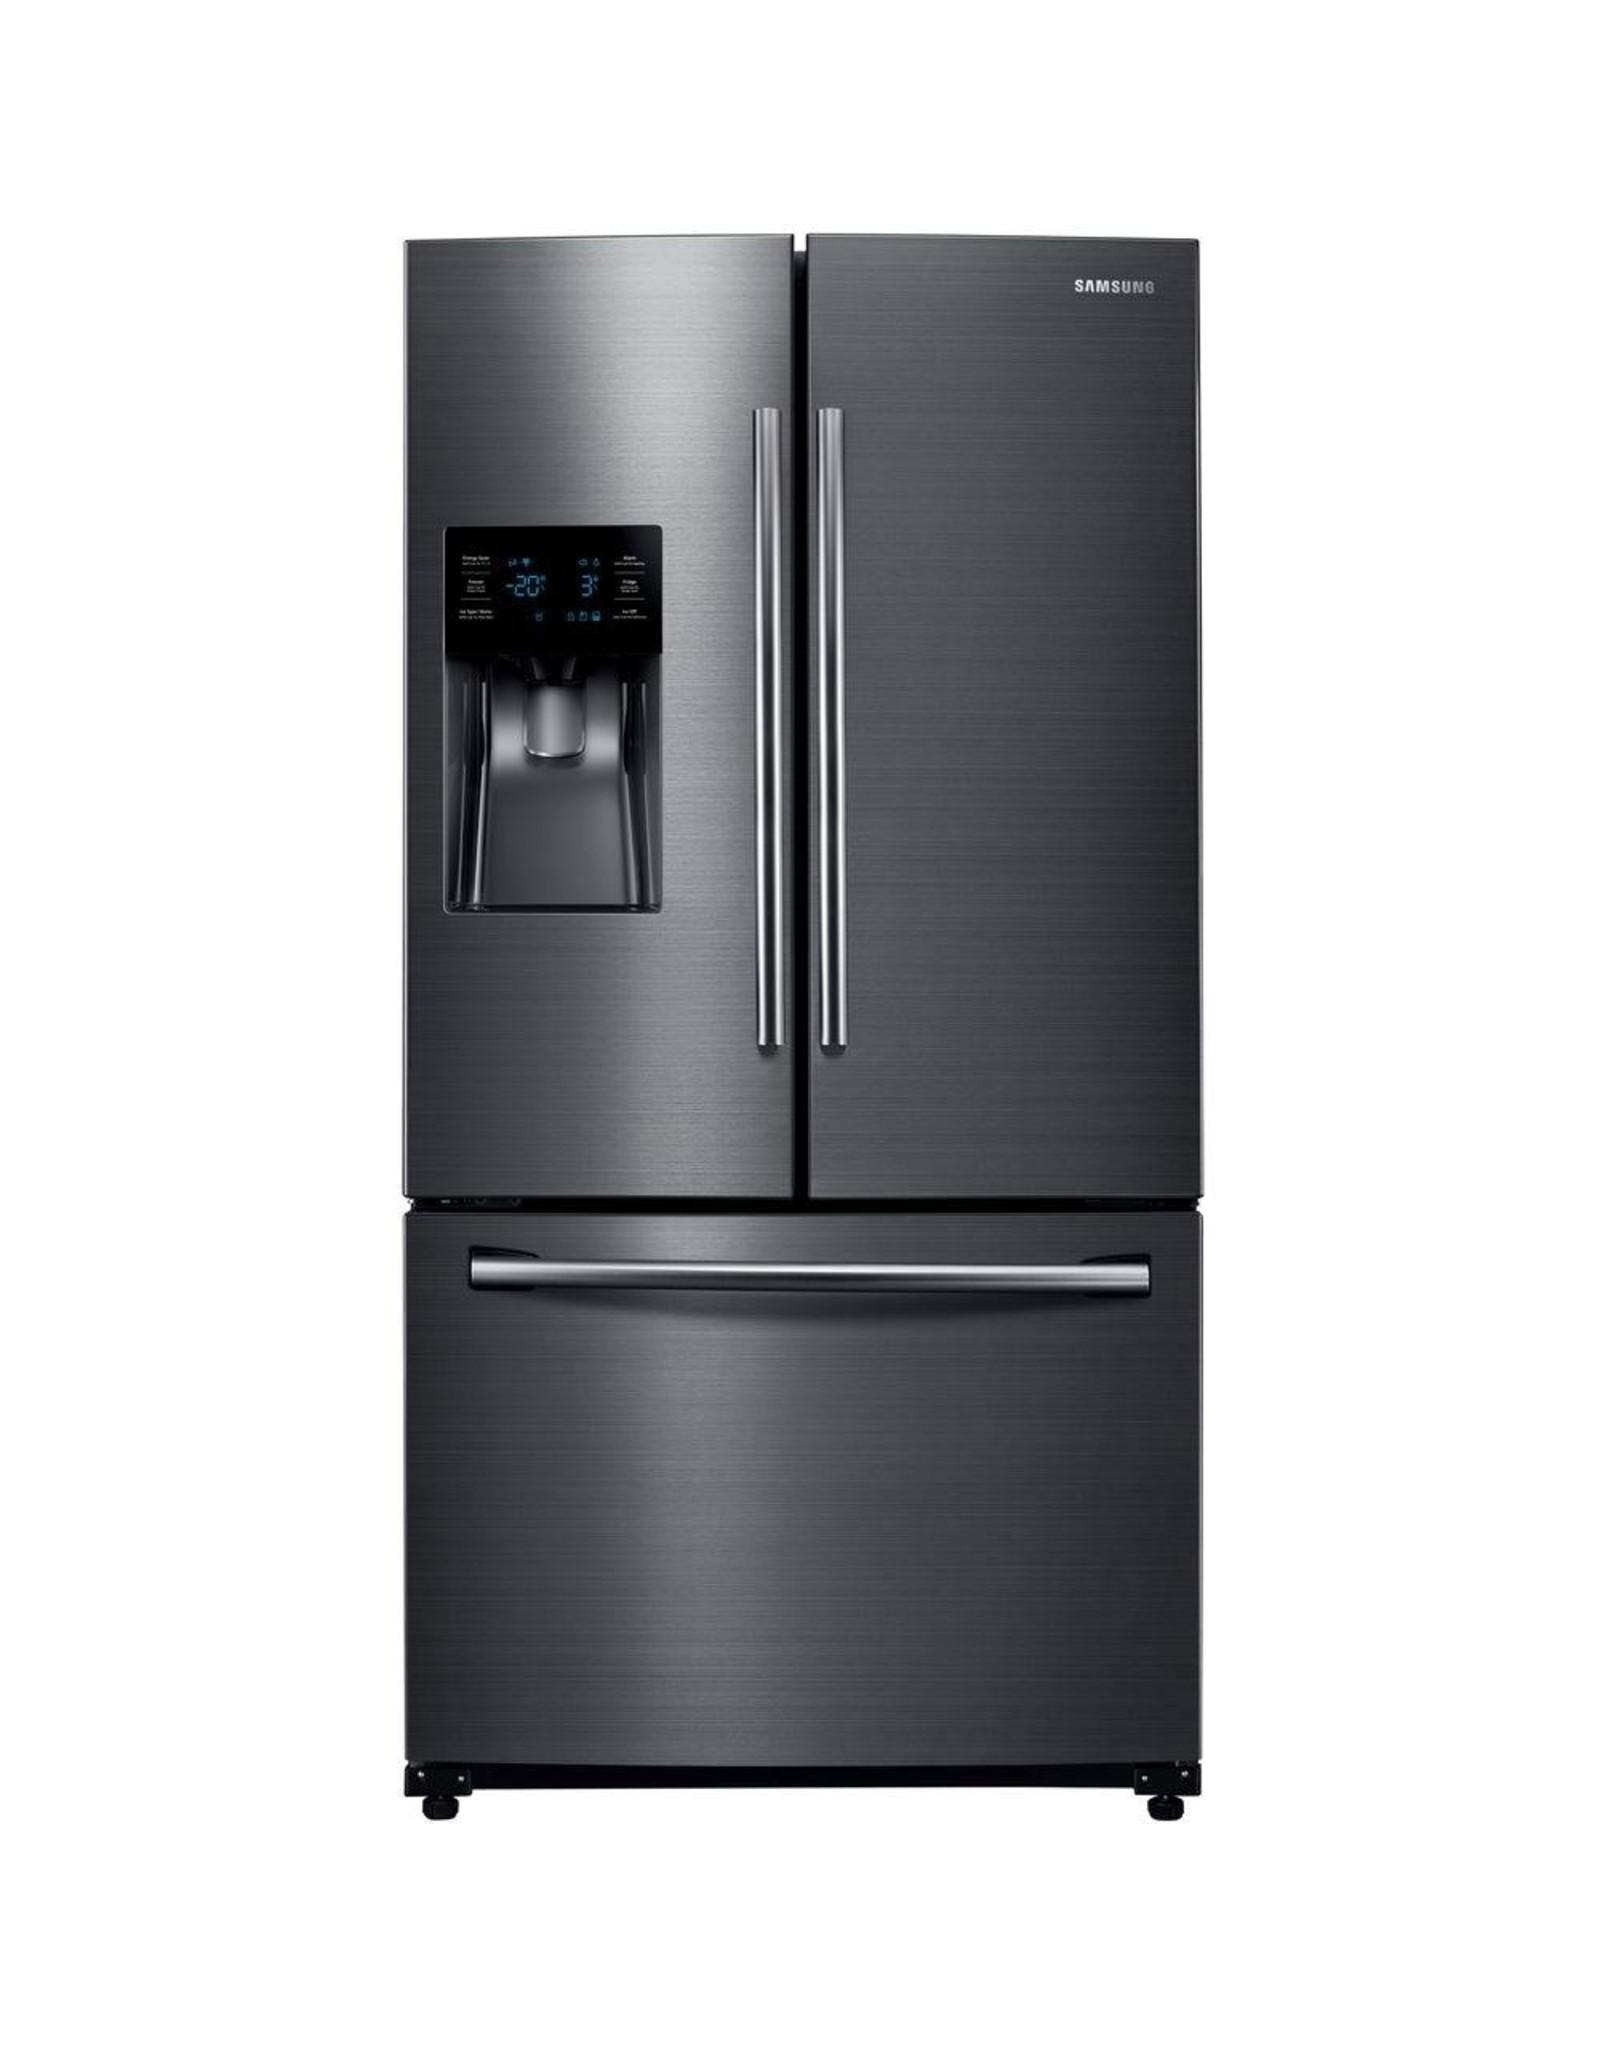 SAMSUNG RF263BEAESG Samsung 26 Cu.Ft. French Door Refrigerator